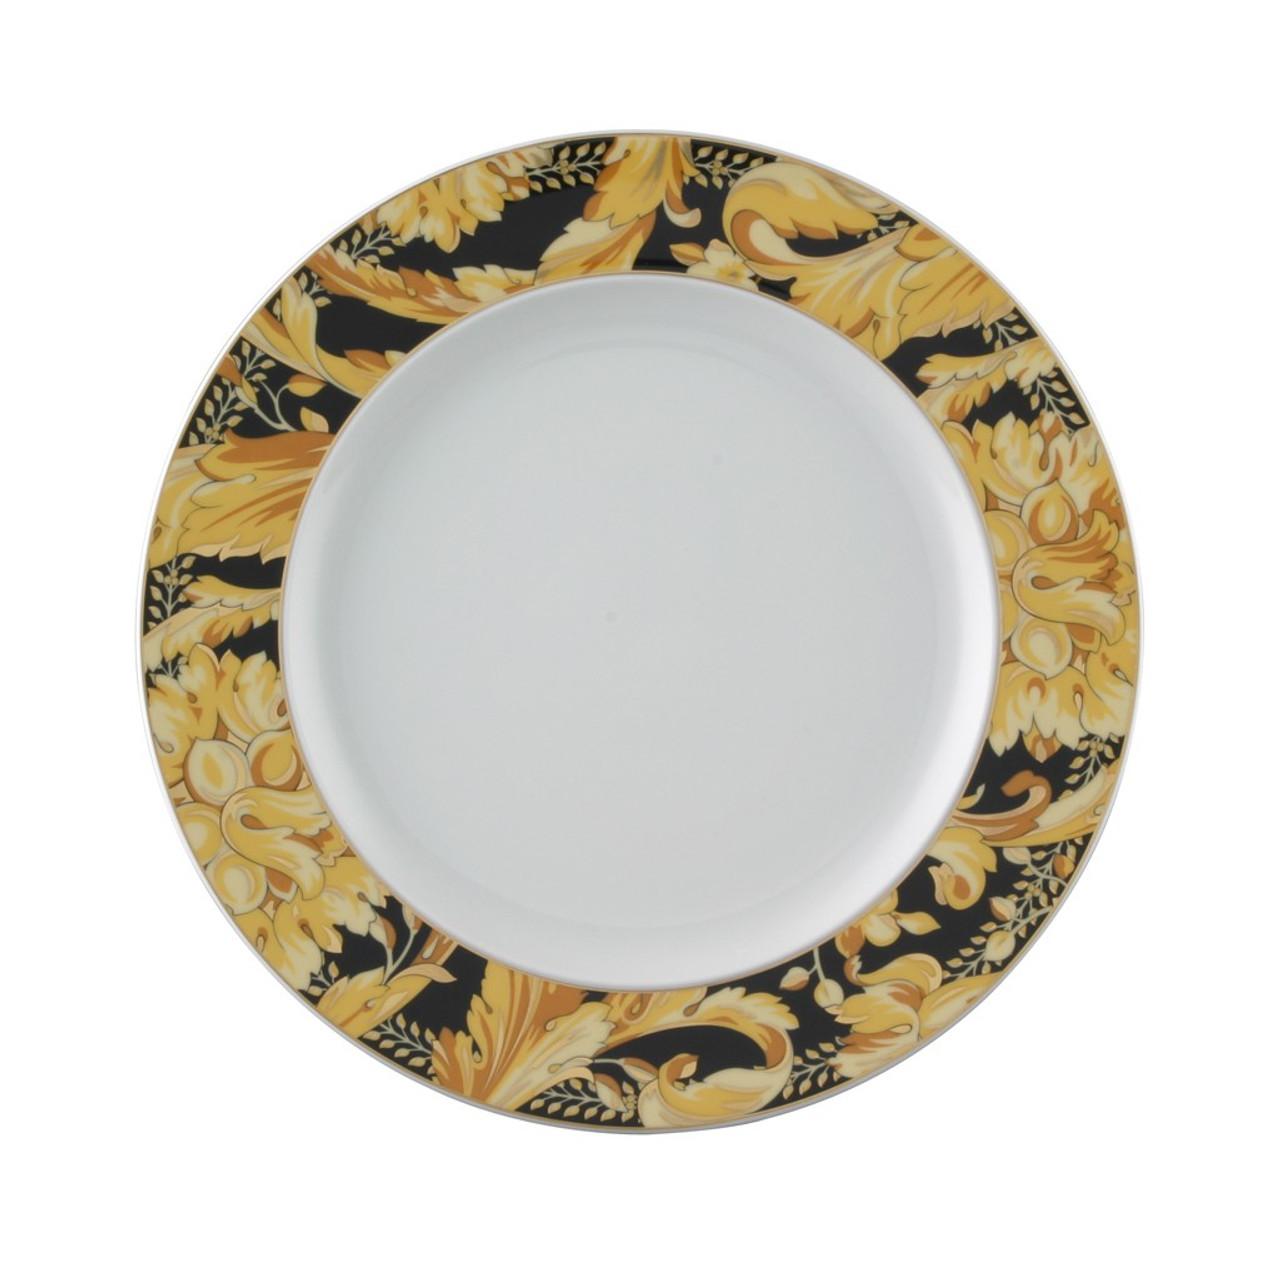 Dinner Plate 10 1/2 inch | Versace Vanity  sc 1 st  Rosenthal & Dinner Plate 10 1/2 inch | Vanity| Rosenthal Shop